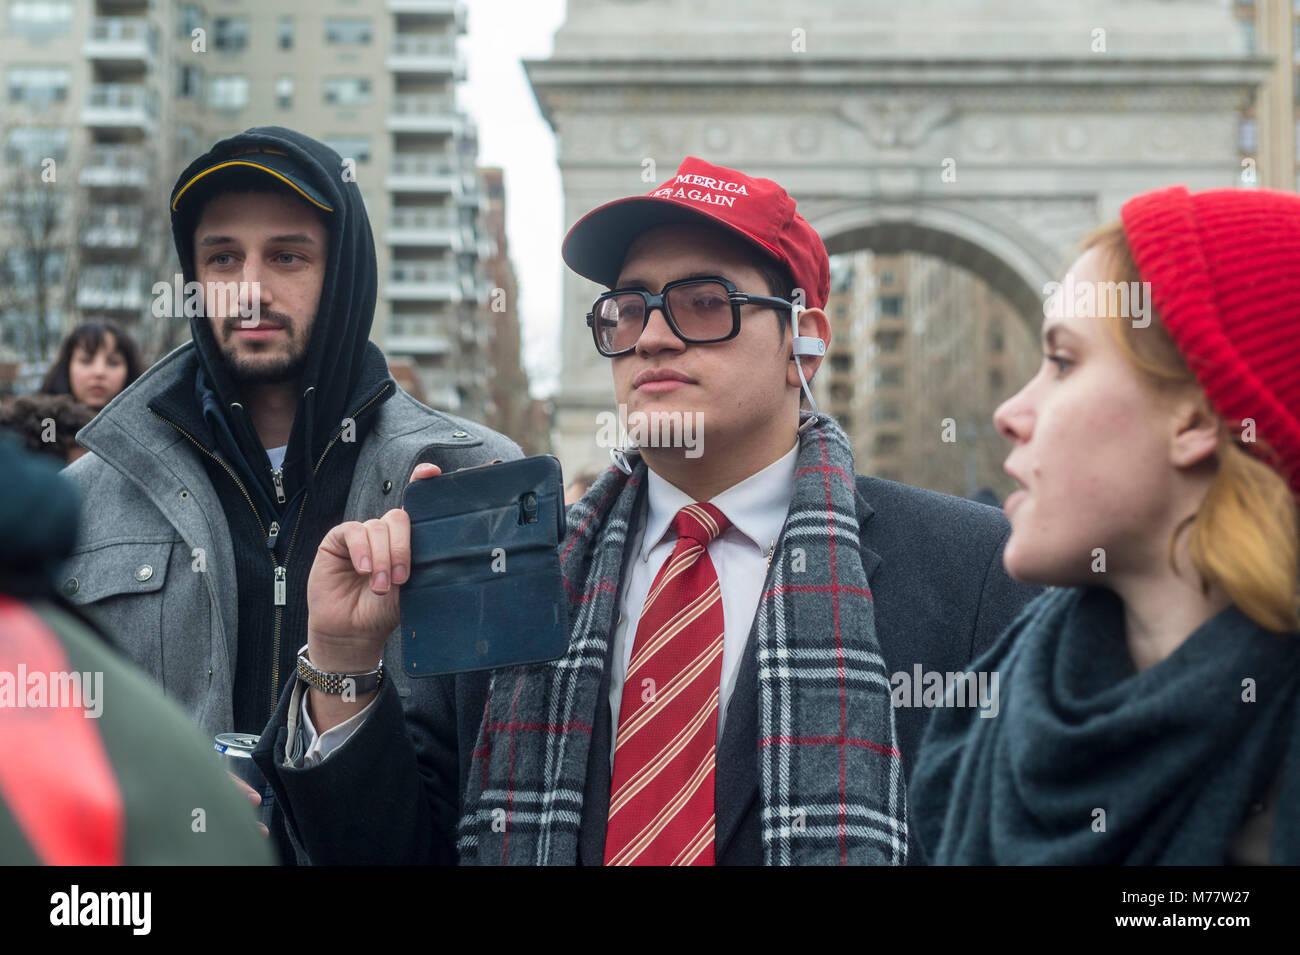 - New York, NY, USA. 8 mars 2018 l'homme dans un nouveau Grand Nord font rouge hat (MAGA) records durig militants Photo Stock